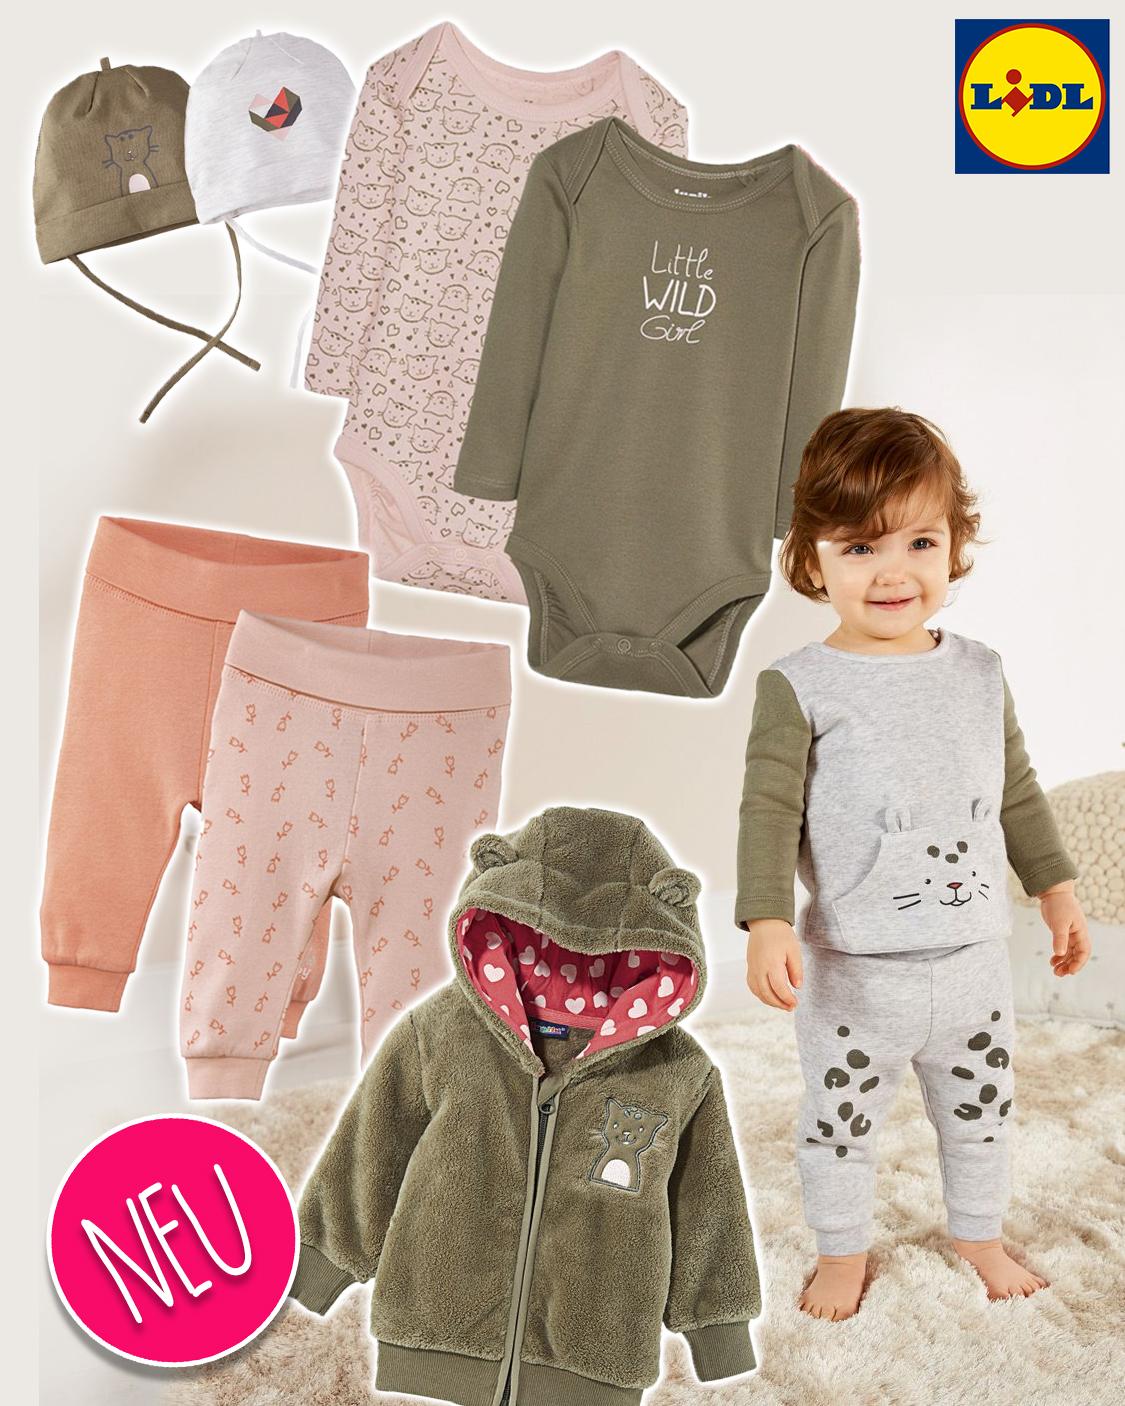 Brandneu Brandneu Verkaufsförderung LIDL: Neue Baby-Kollektion ab 2,99€ | MeinBaby123.de